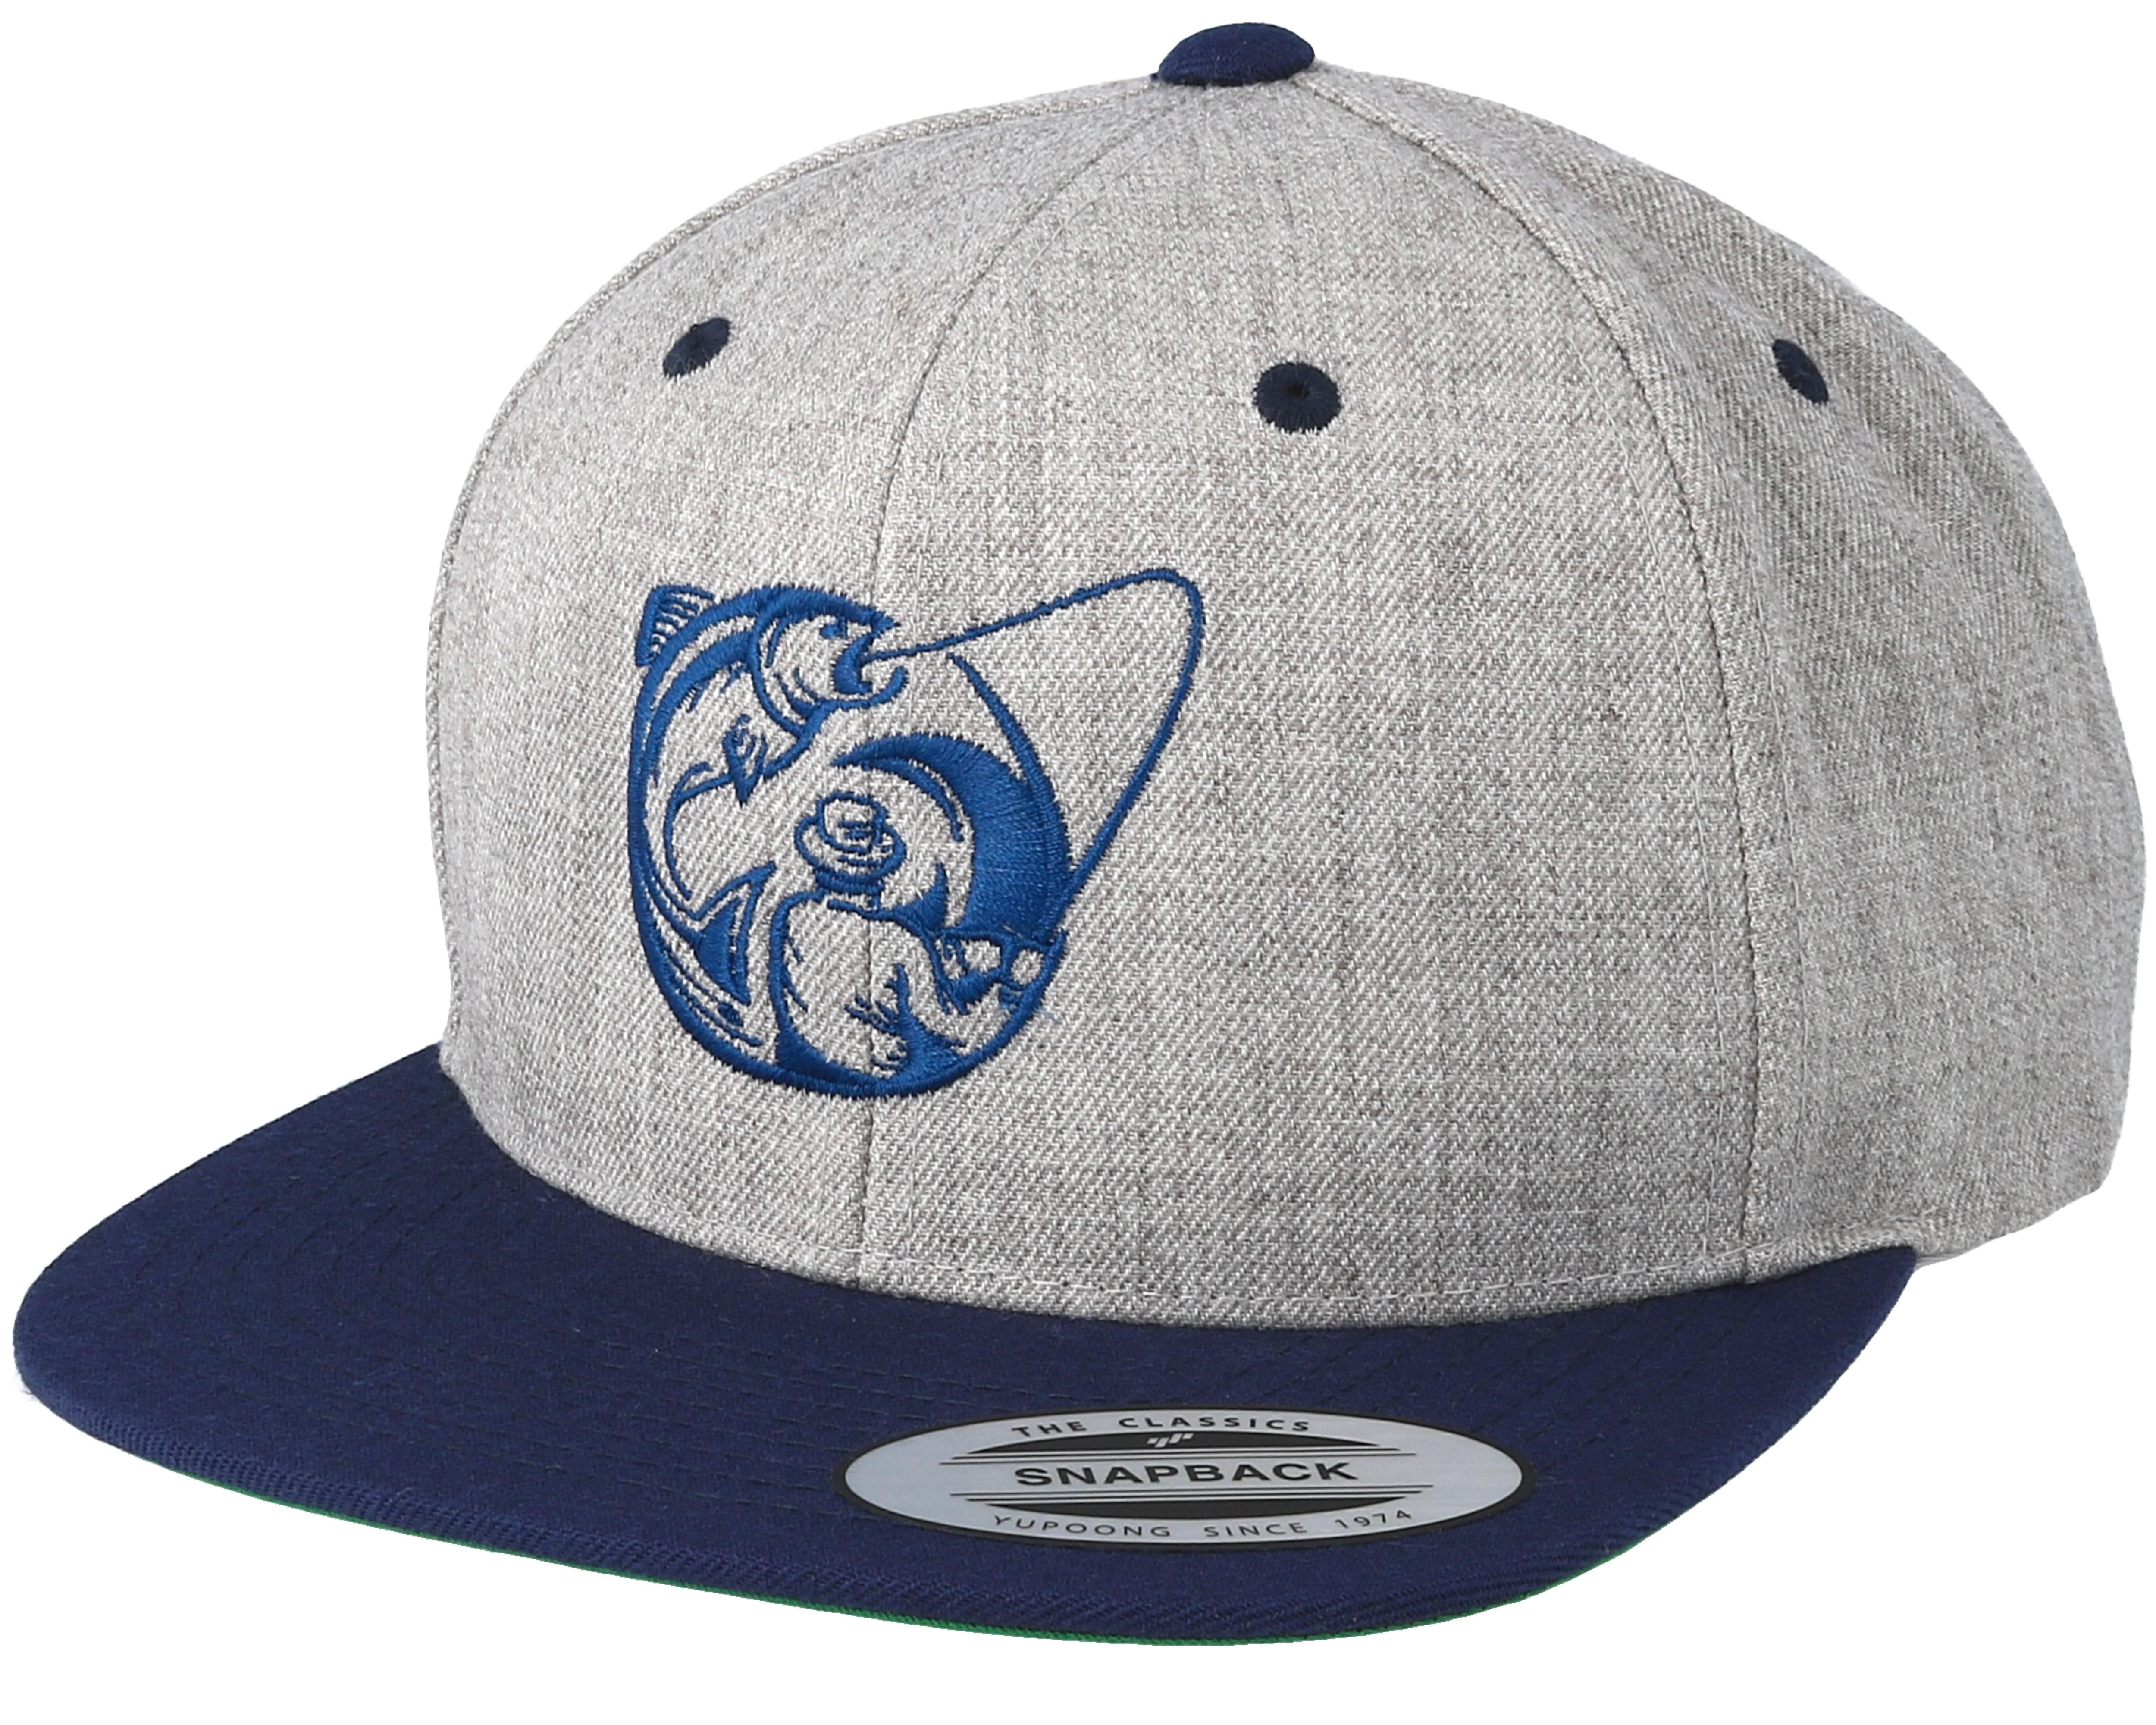 Fishing circle grey navy snapback hunter caps hatstore for Fishing snapback hats